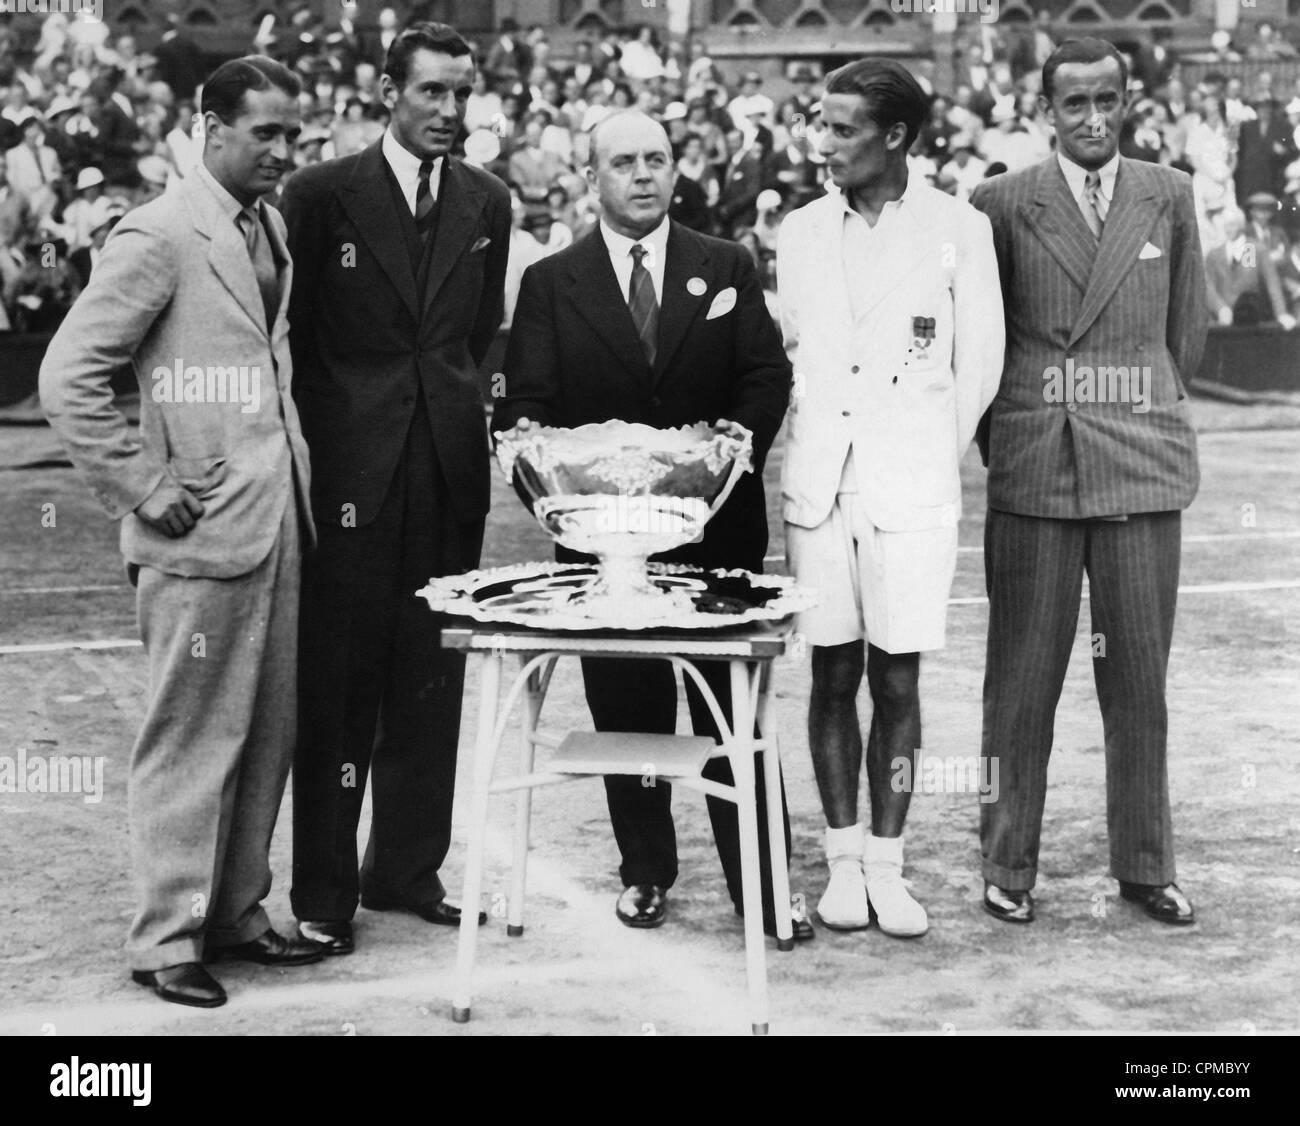 The British tennis team wins the Davis Cup, 1934 - Stock Image